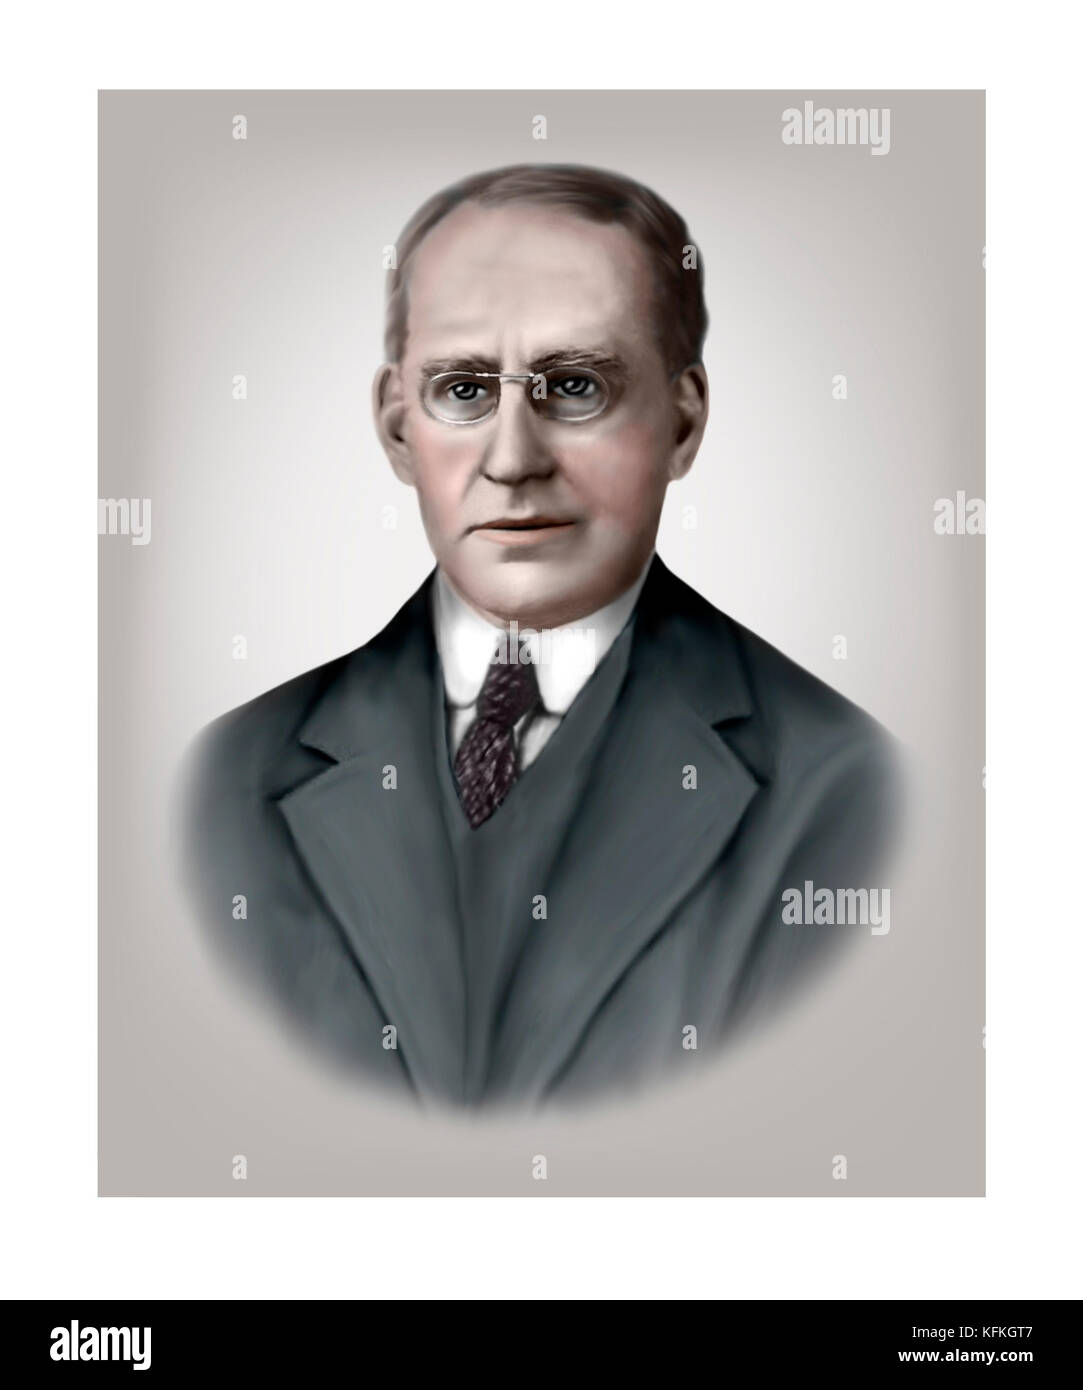 Arthur Eddington, 1882 - 1944, English Astronomer, Physicist, Mathematician - Stock Image